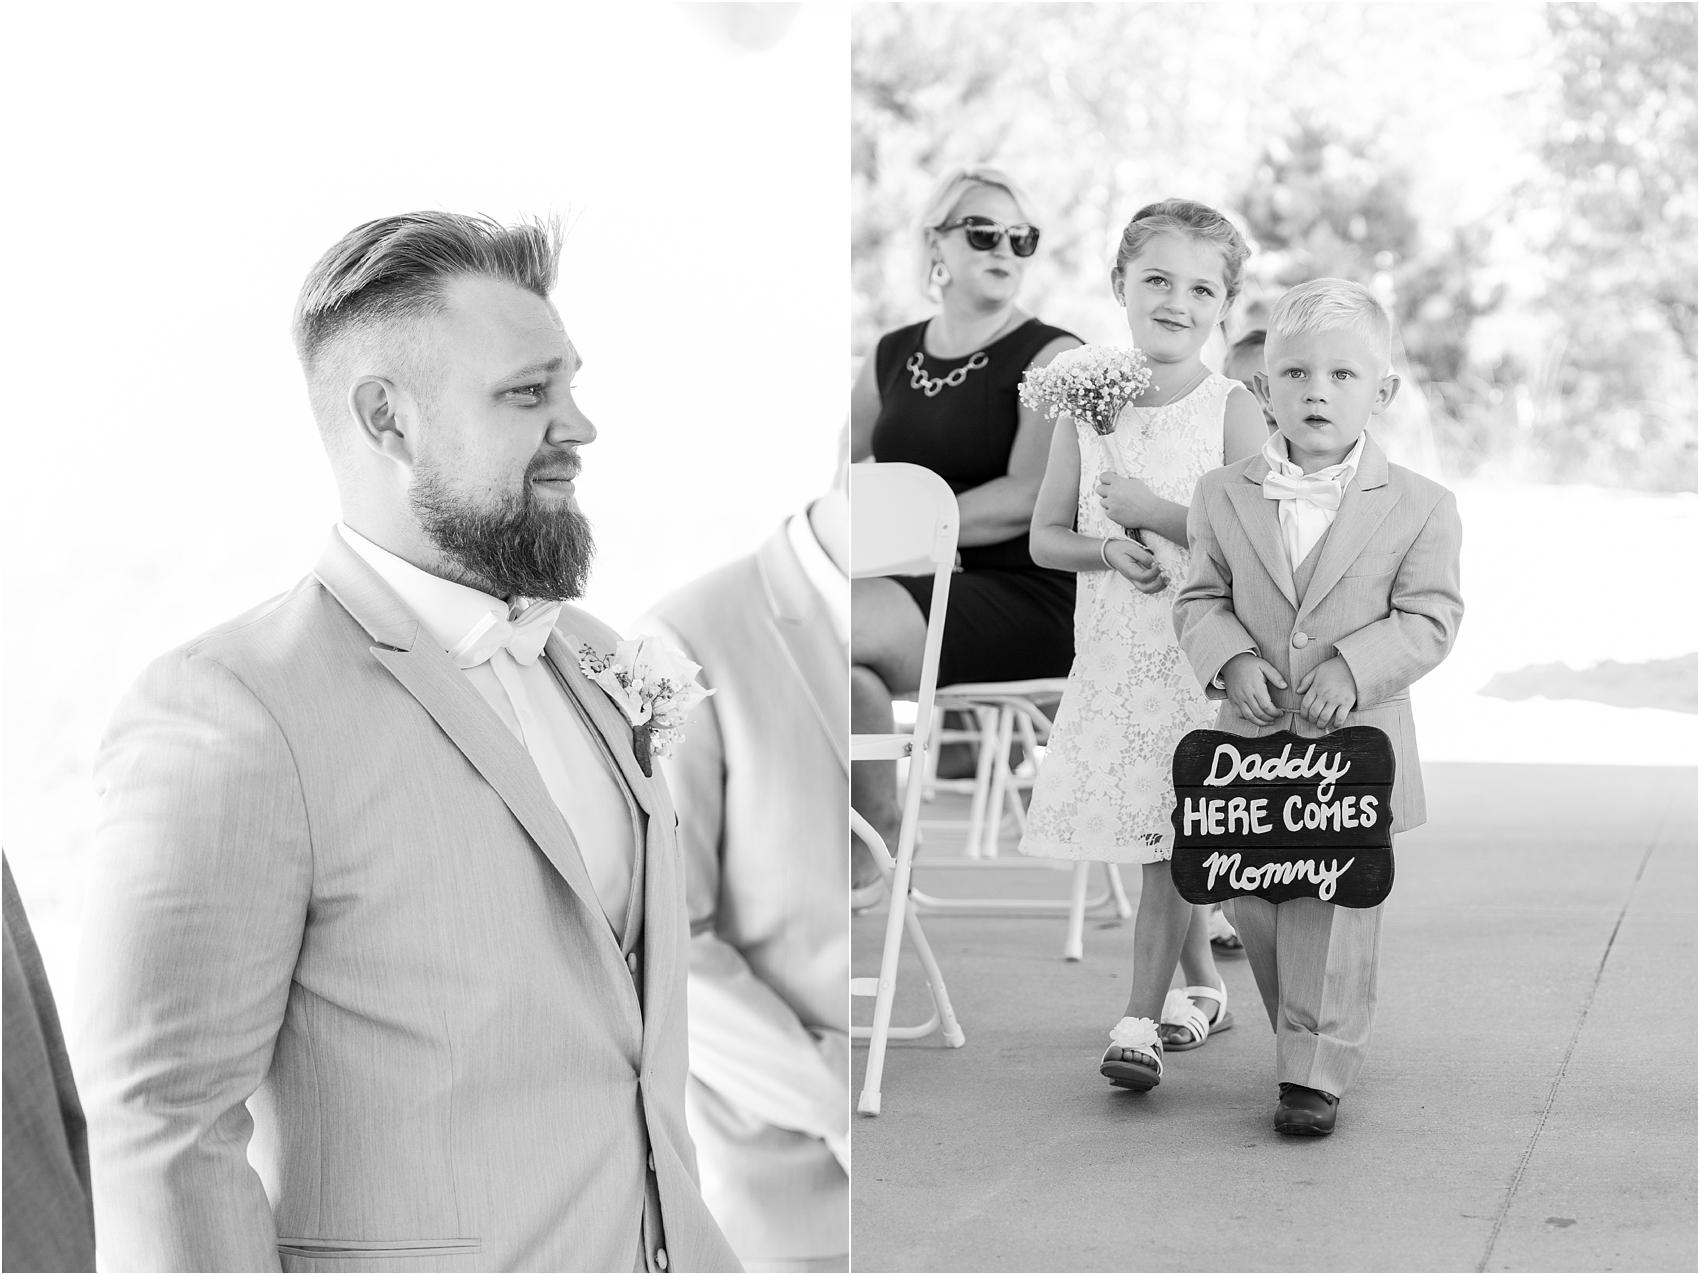 fun-whimsical-beach-wedding-photos-in-st-joseph-michigan-by-courtney-carolyn-photography_0061.jpg